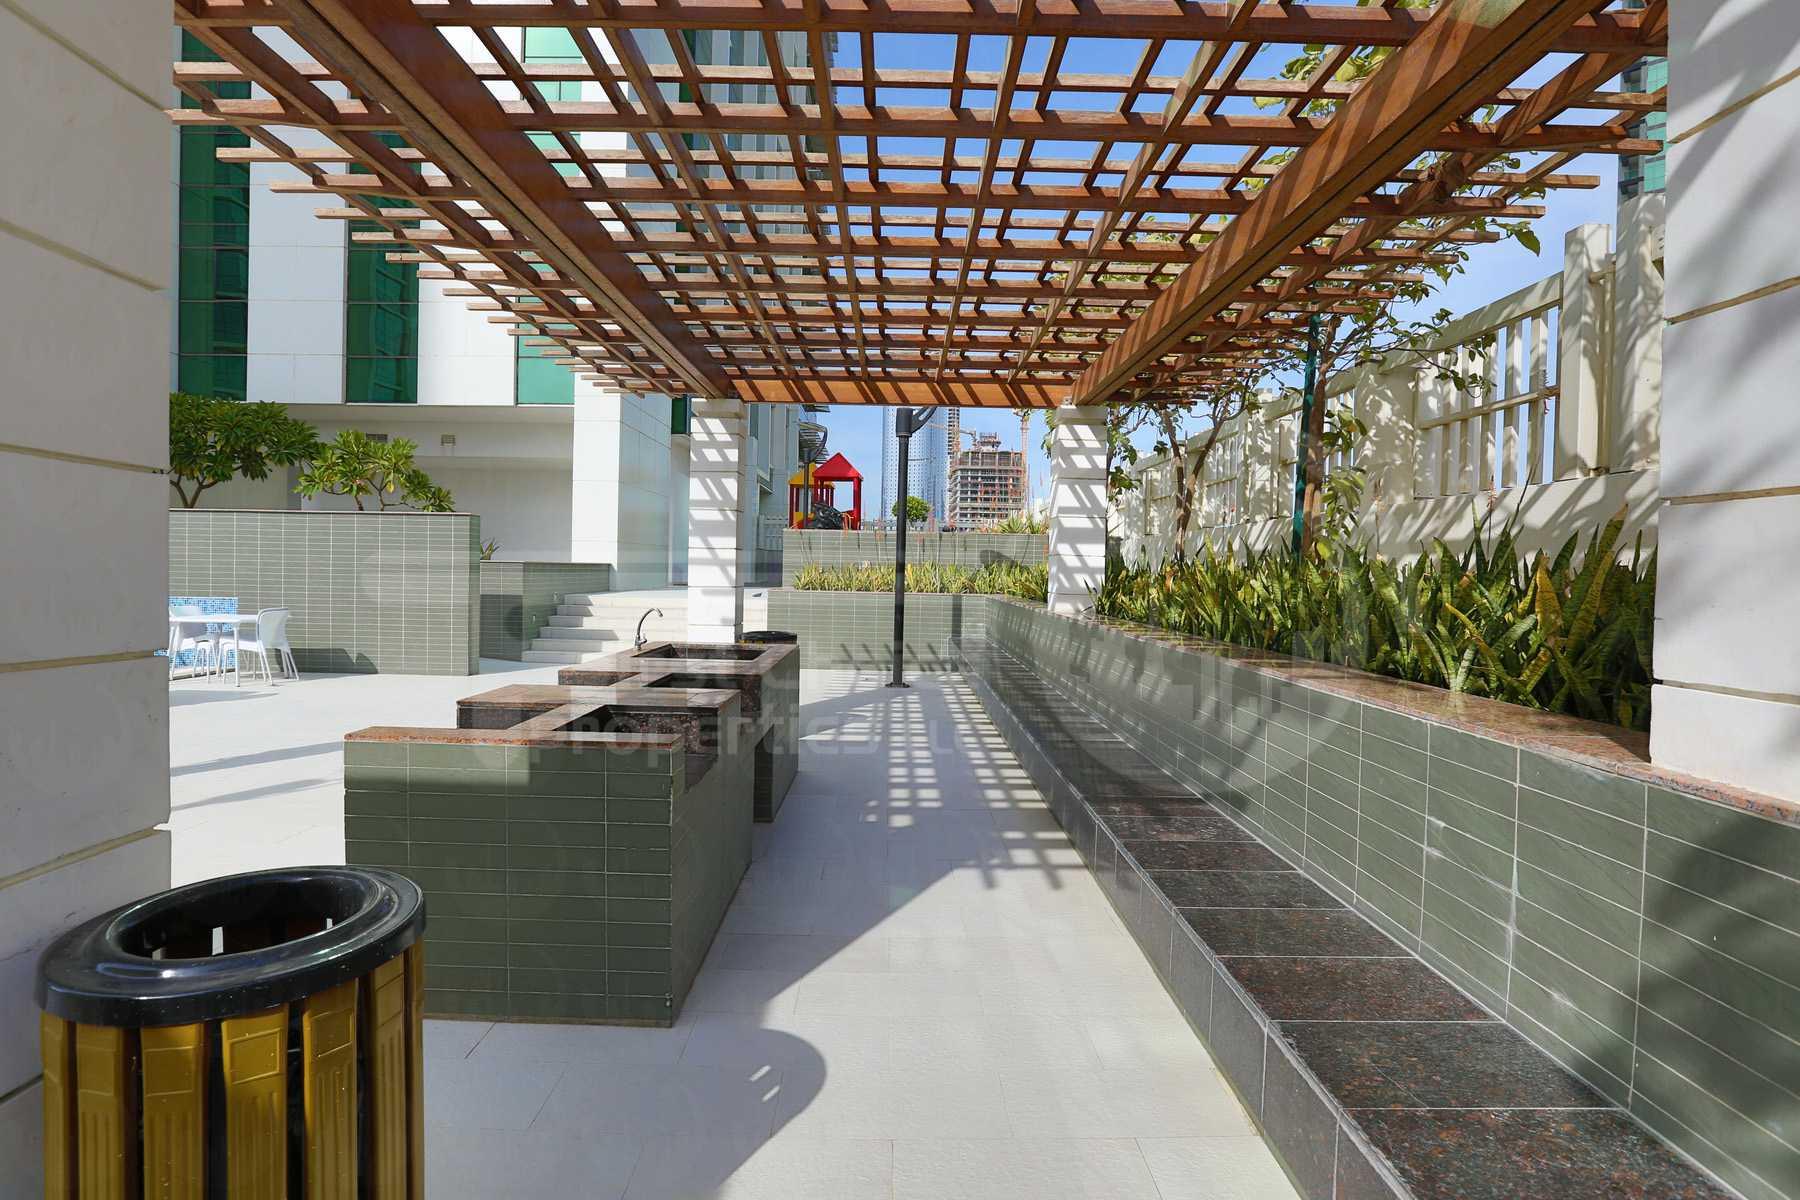 Studio - 1BR - 2BR - 3BR - 4BR Apartment - Abu Dhabi - UAE - Al Reem Island - Tala Tower - Outside View (8).jpg